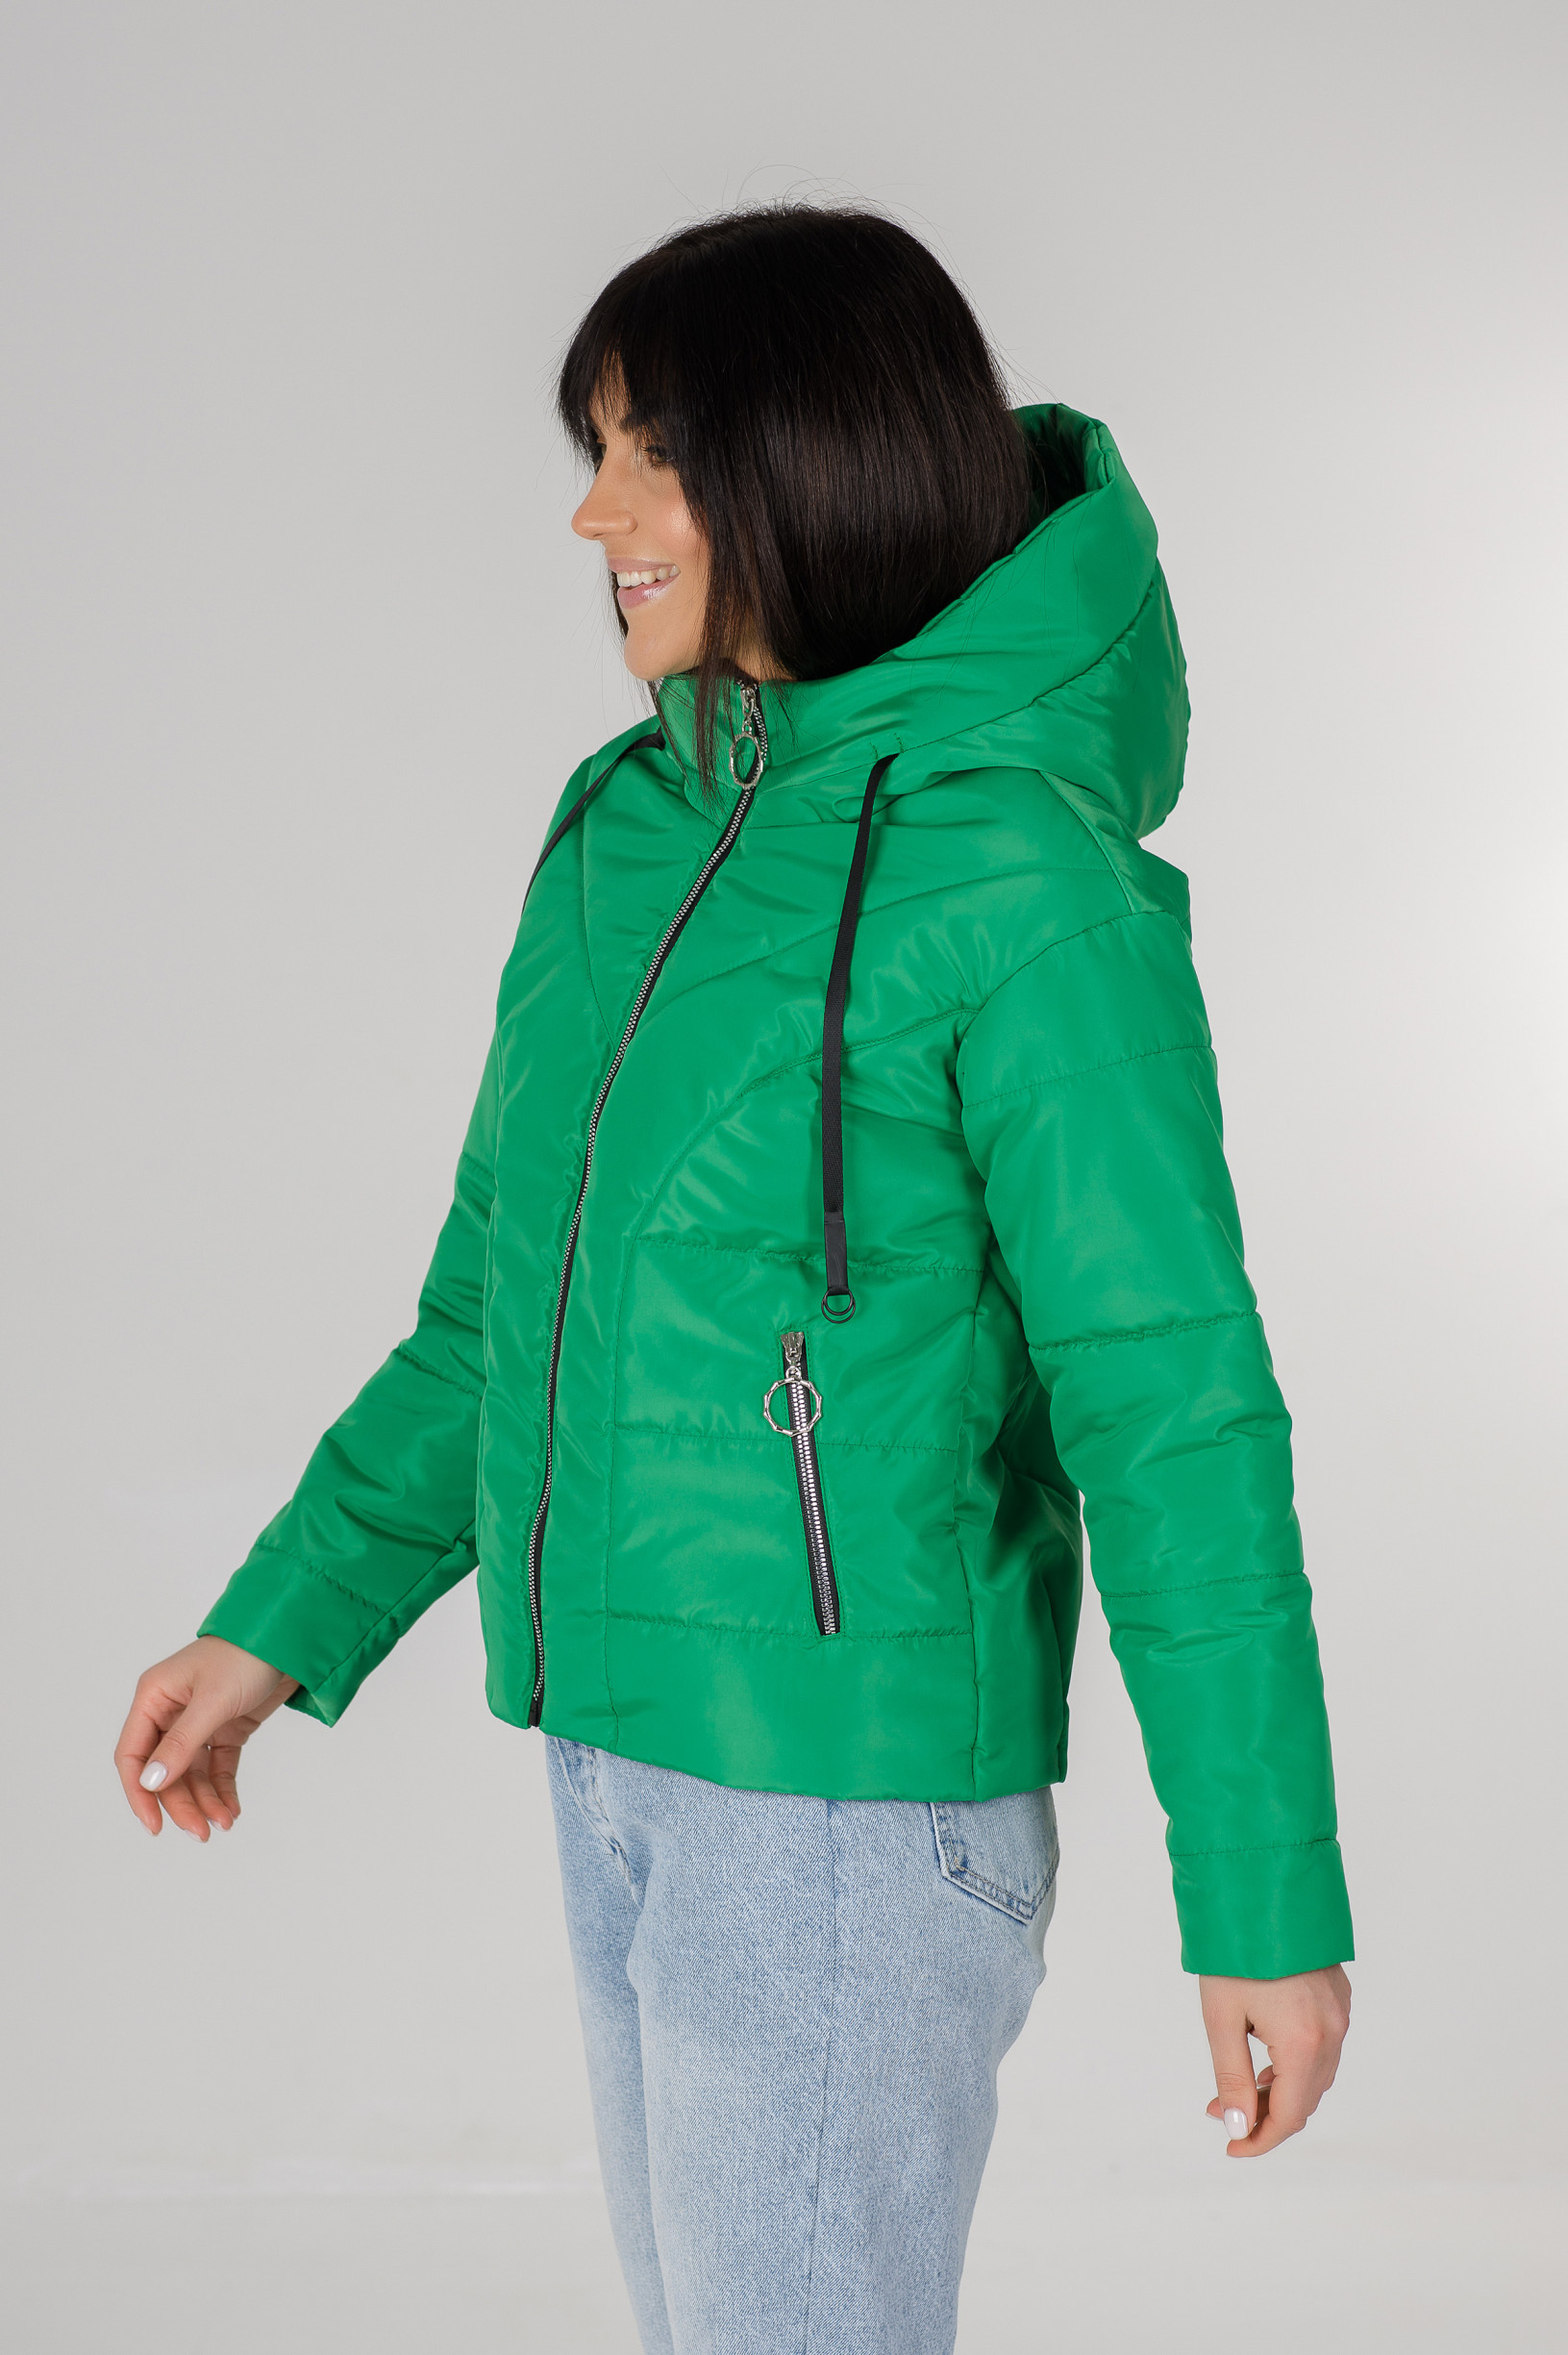 Стильная зелёная весенняя куртка Ася